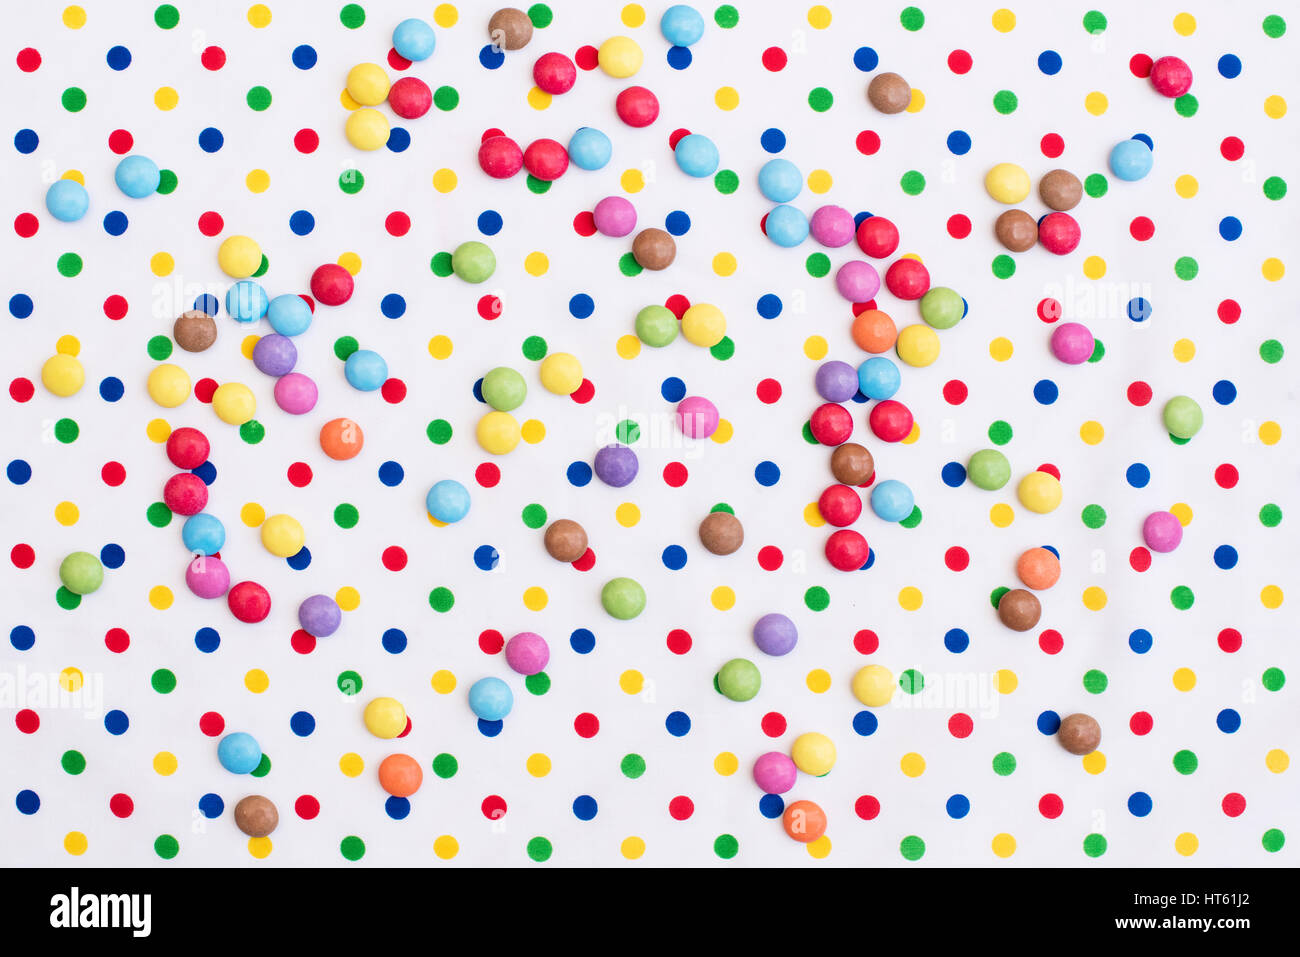 Smarties auf bunte Polka Dot Tischdecke. Muster Stockbild